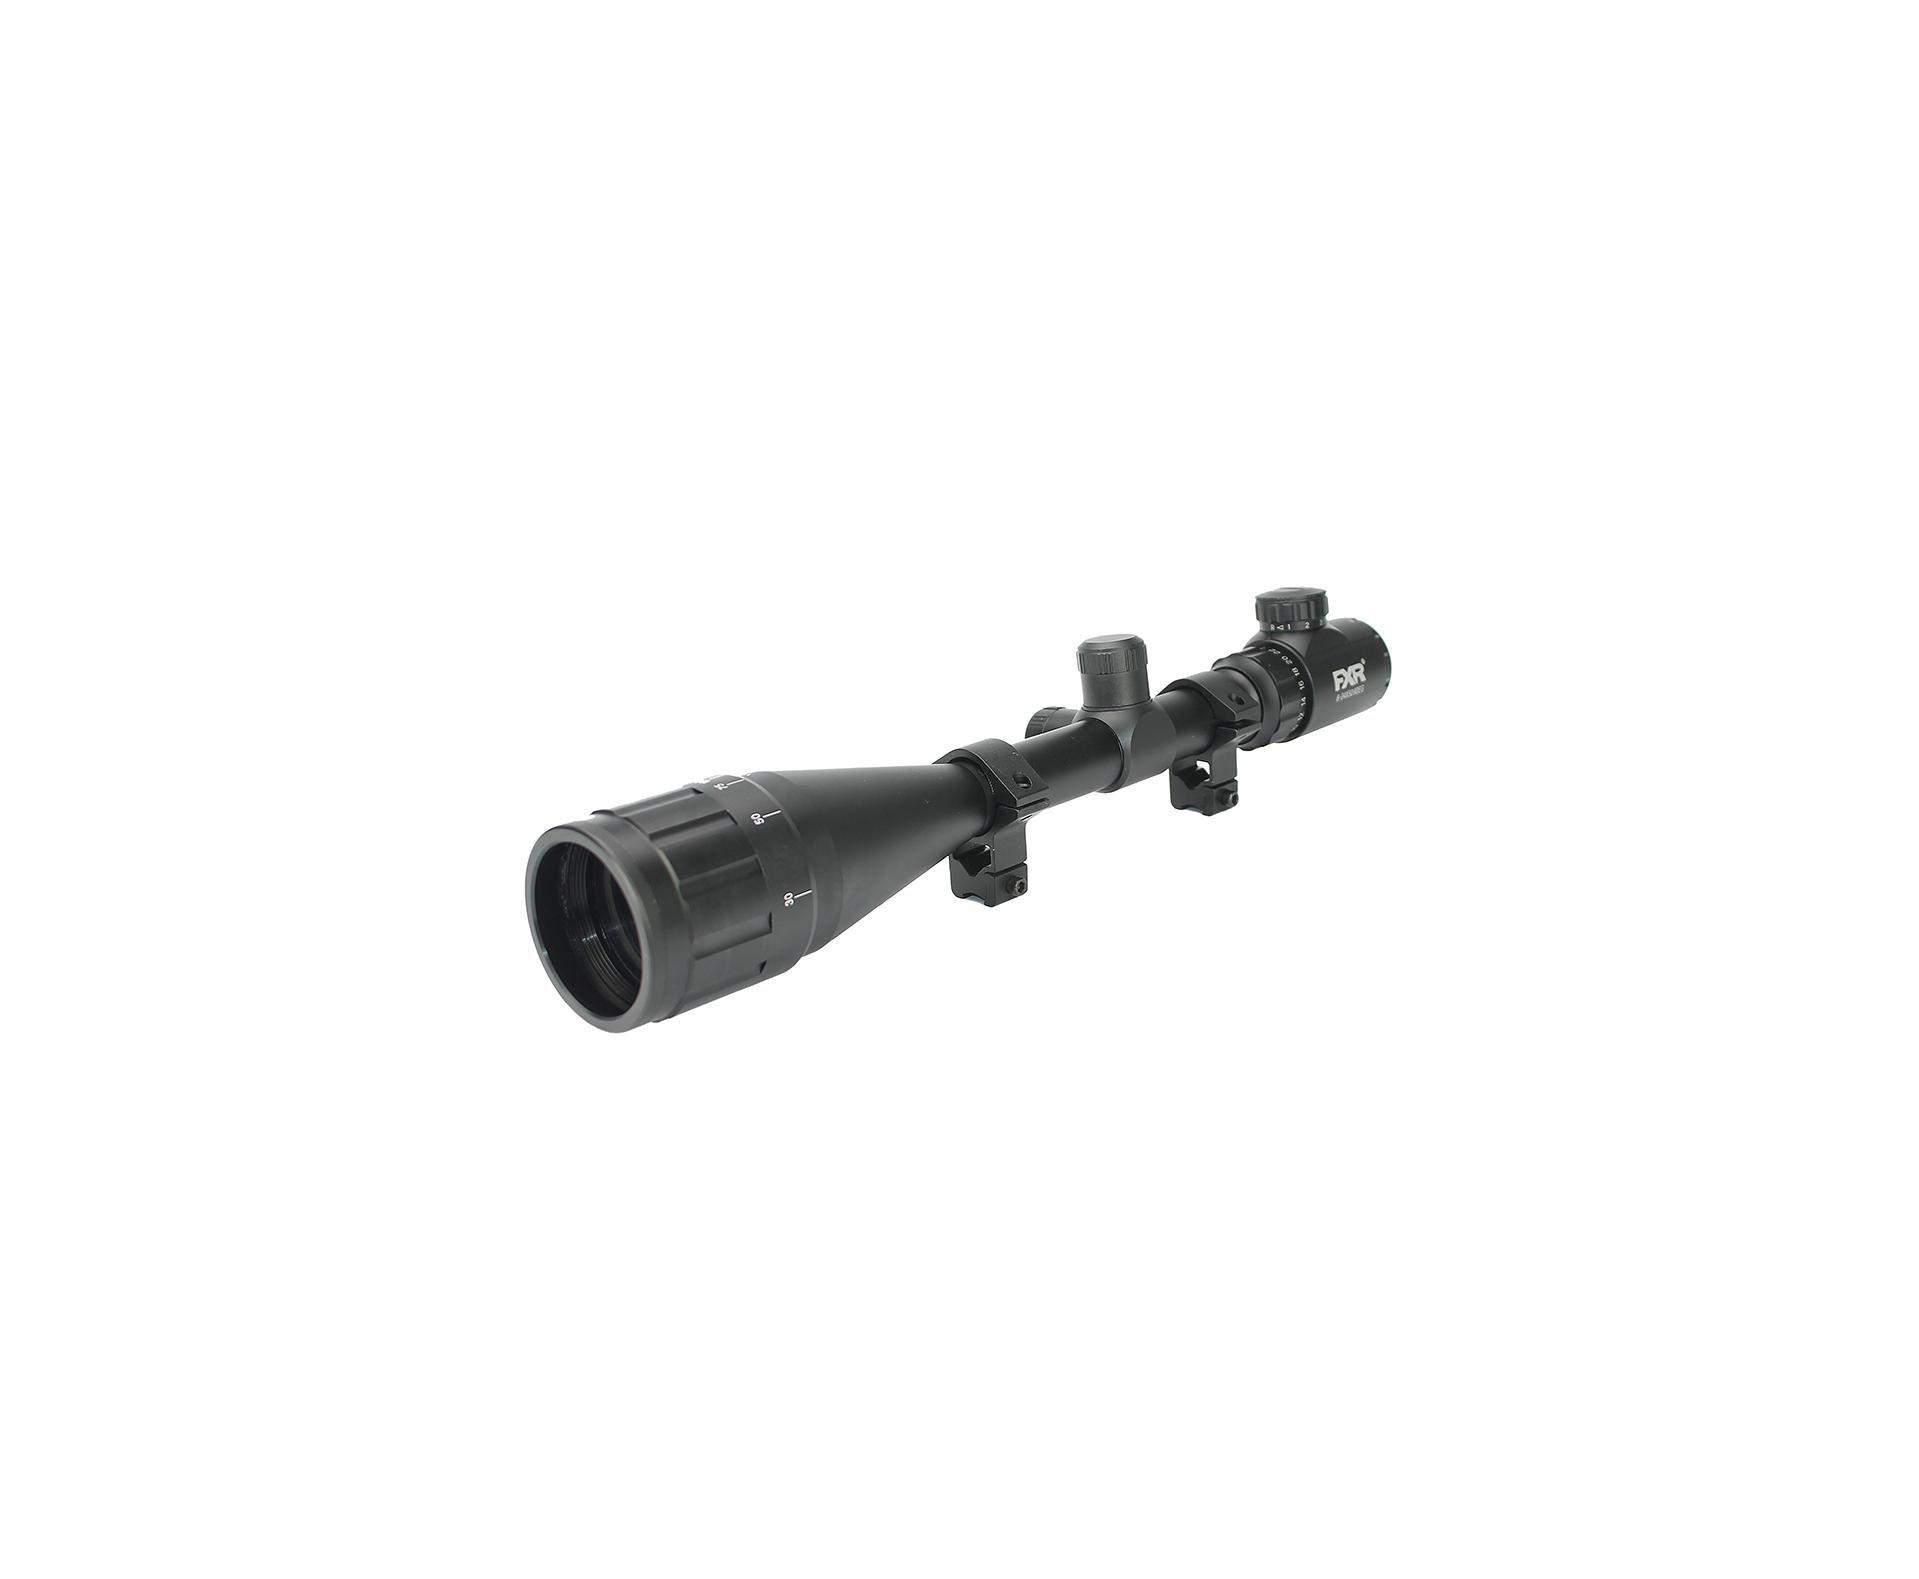 Luneta 6-24x50 Aoe Mil Dot E Paralax Mount 11mm Spa Artemis - Fxr